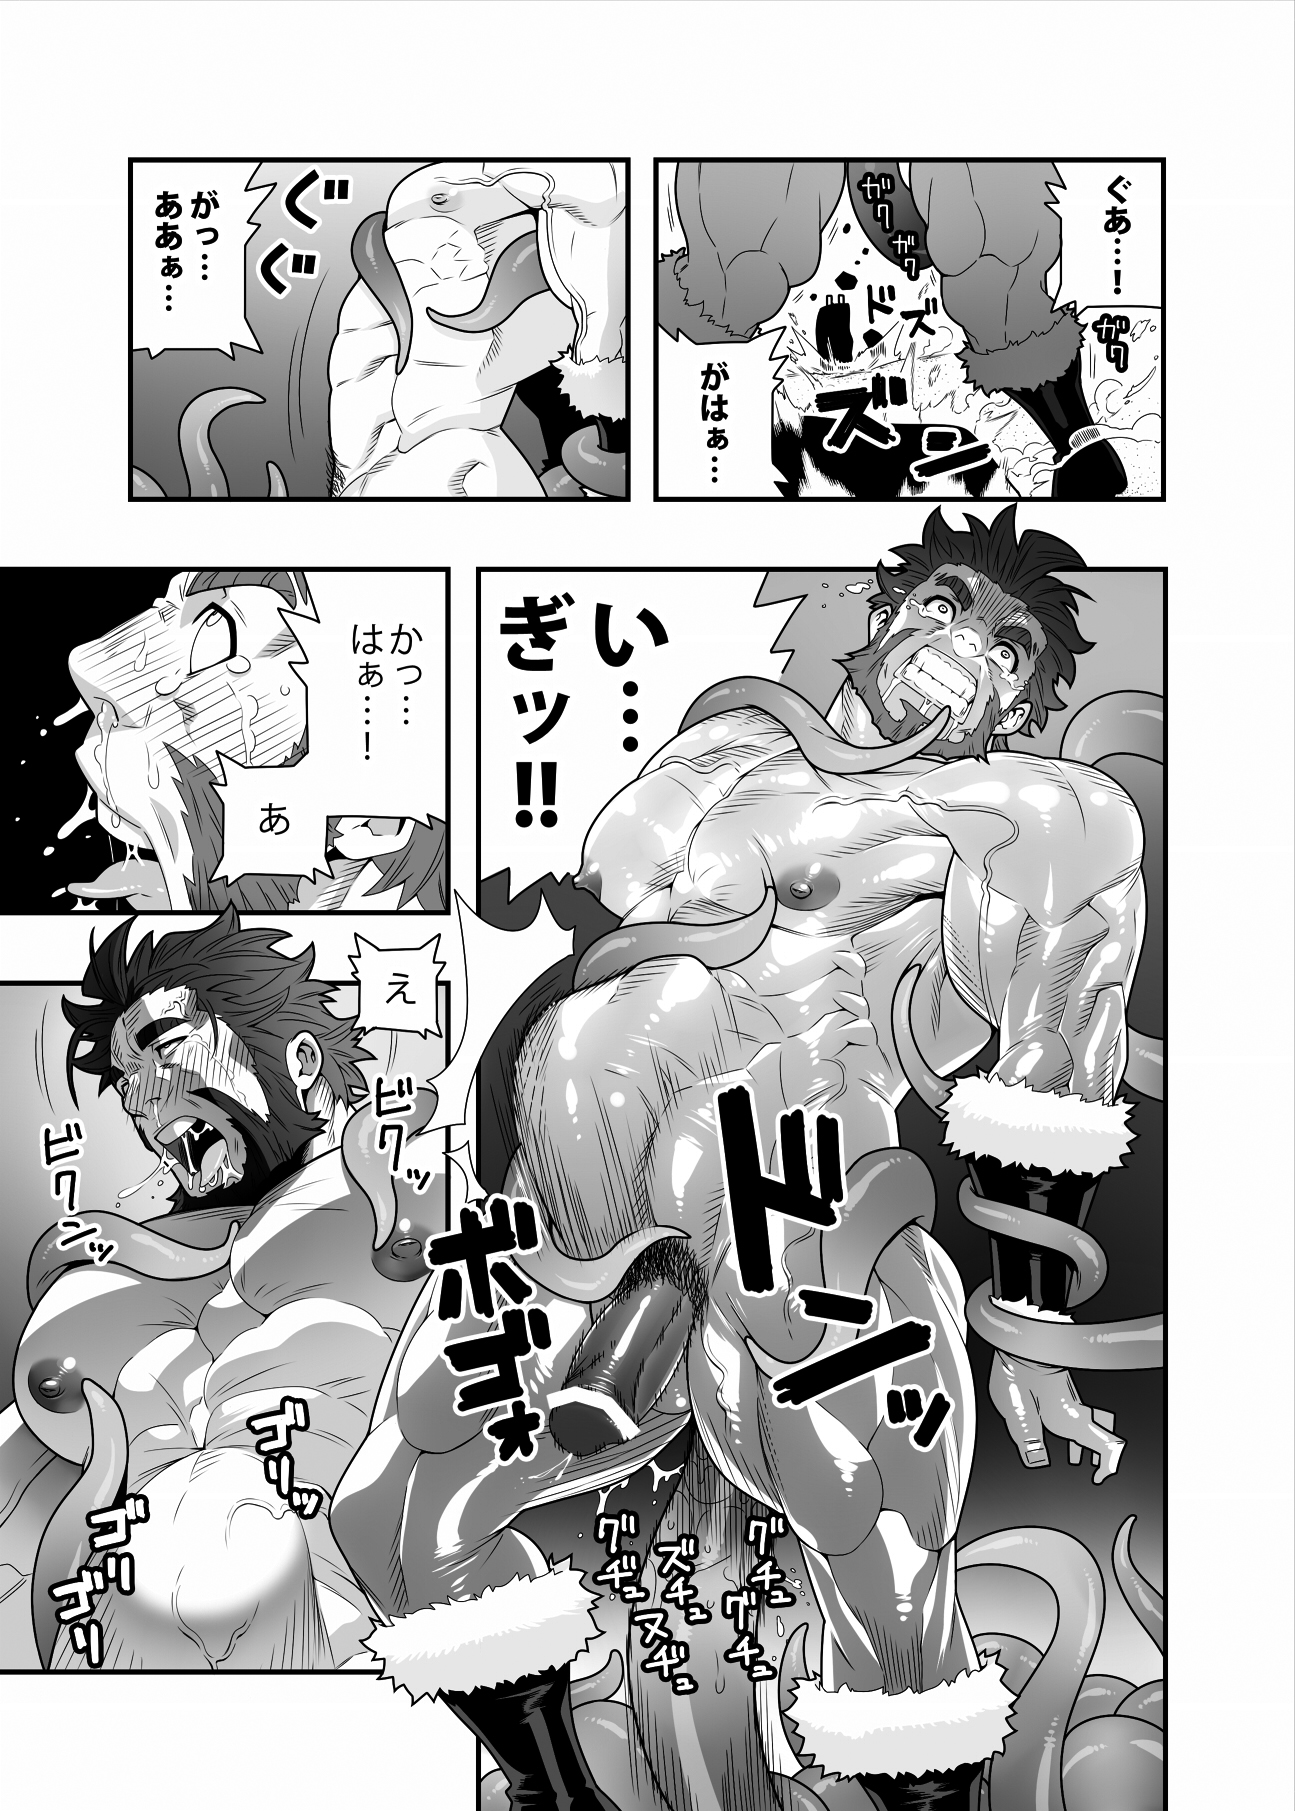 Aheago Comics image 34591: ahegao anal bulge comic male nipple_play